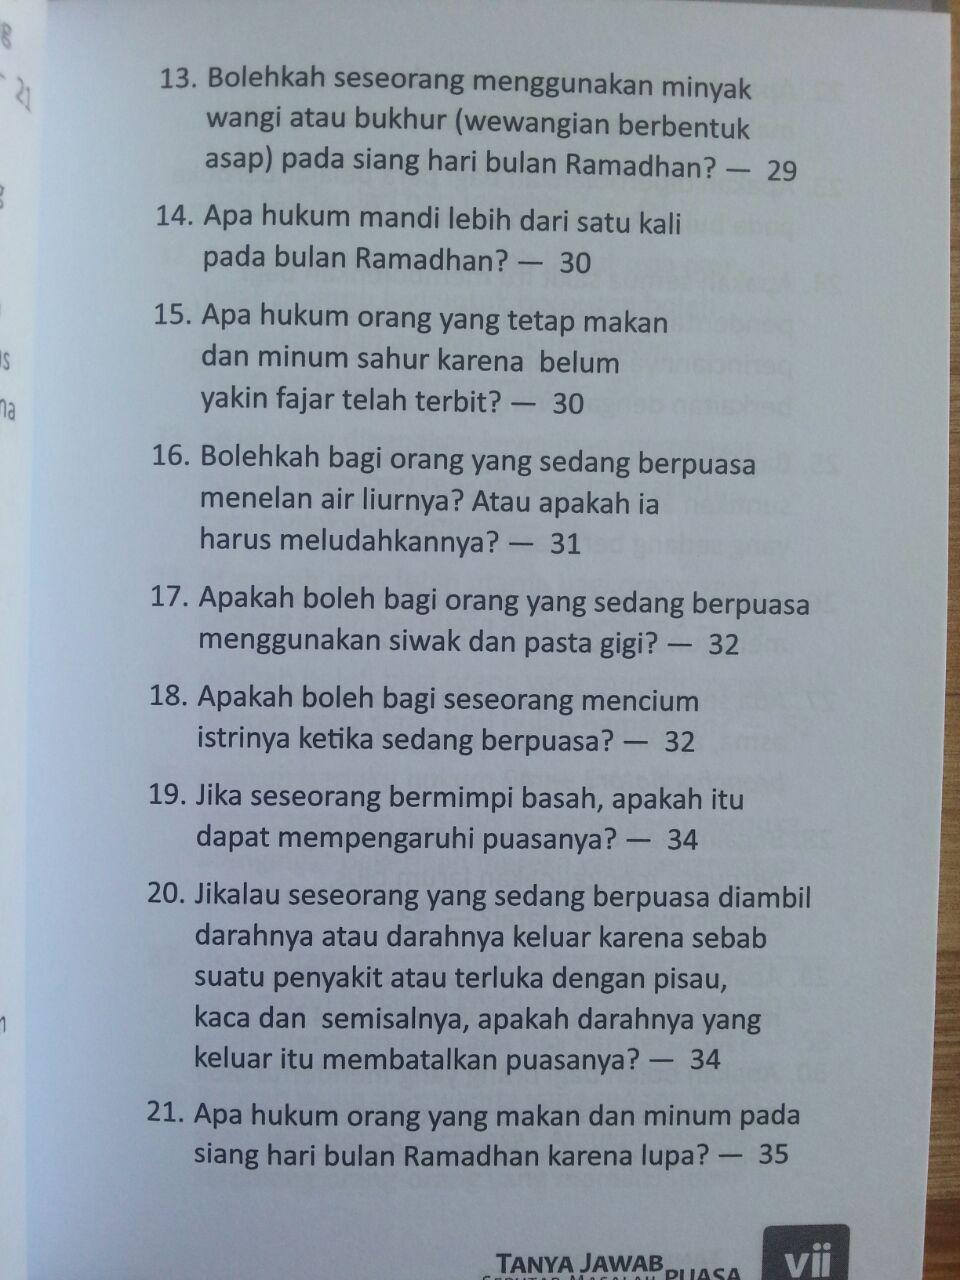 Buku Tanya Jawab Seputar Masalah Puasa isi 2